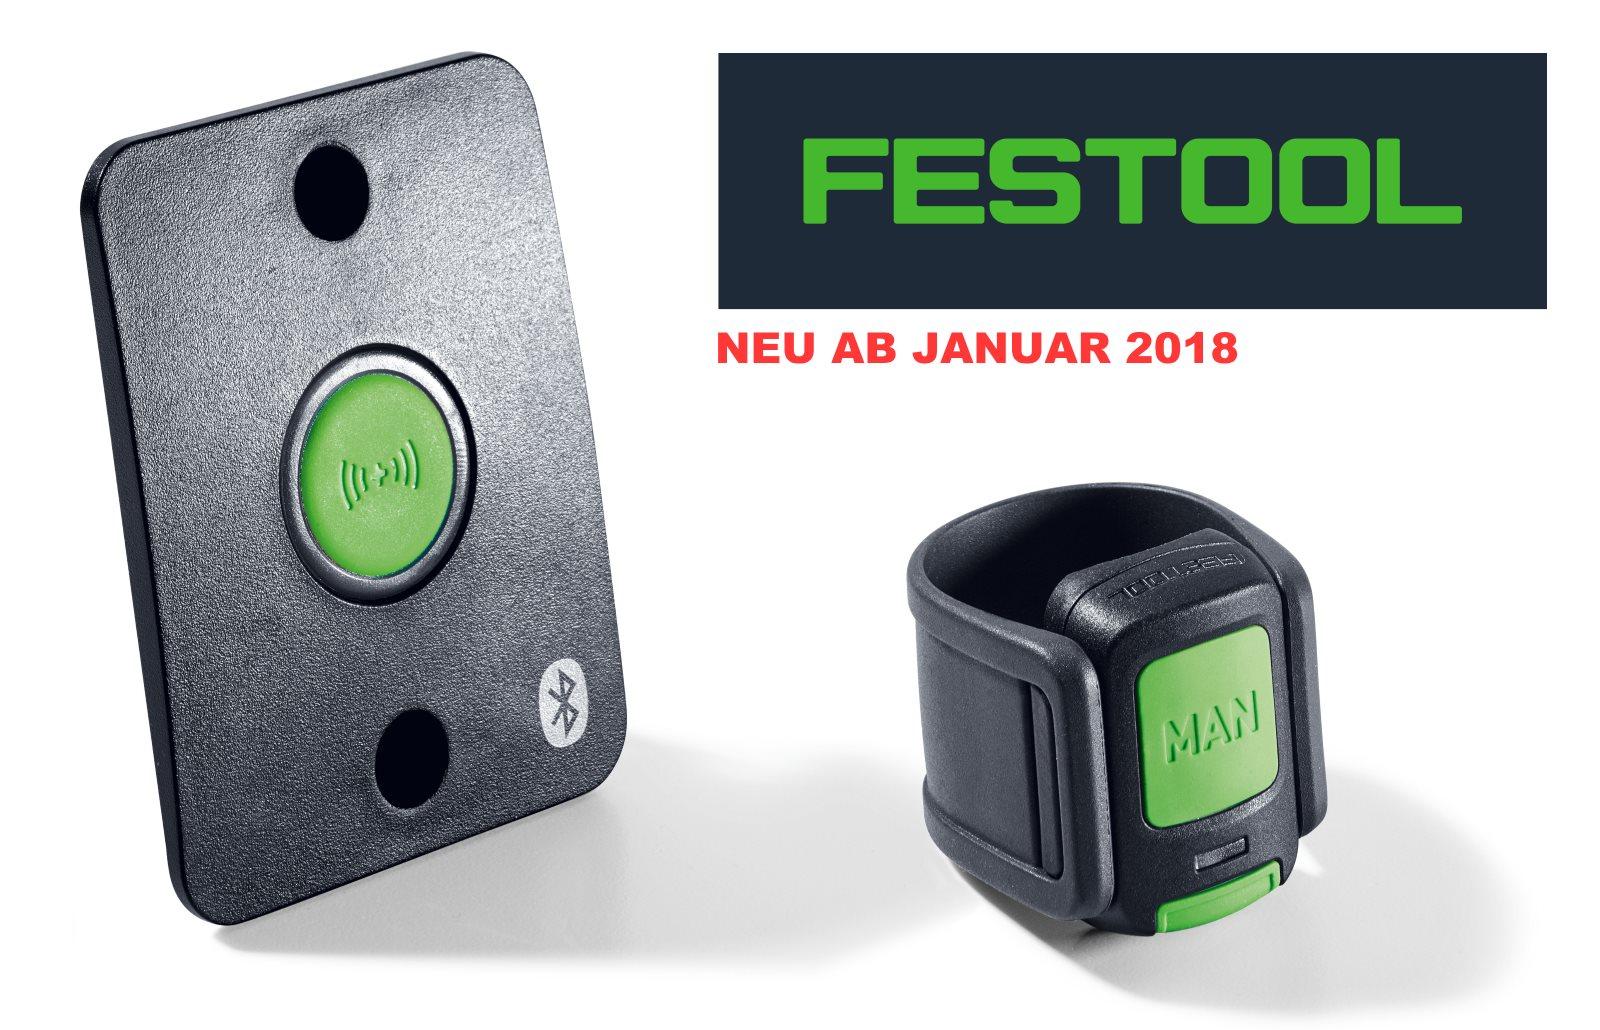 FESTOOL Bluetooth Fernbedienung für CLEANTEC Absaugmobile Neu Januar 2018